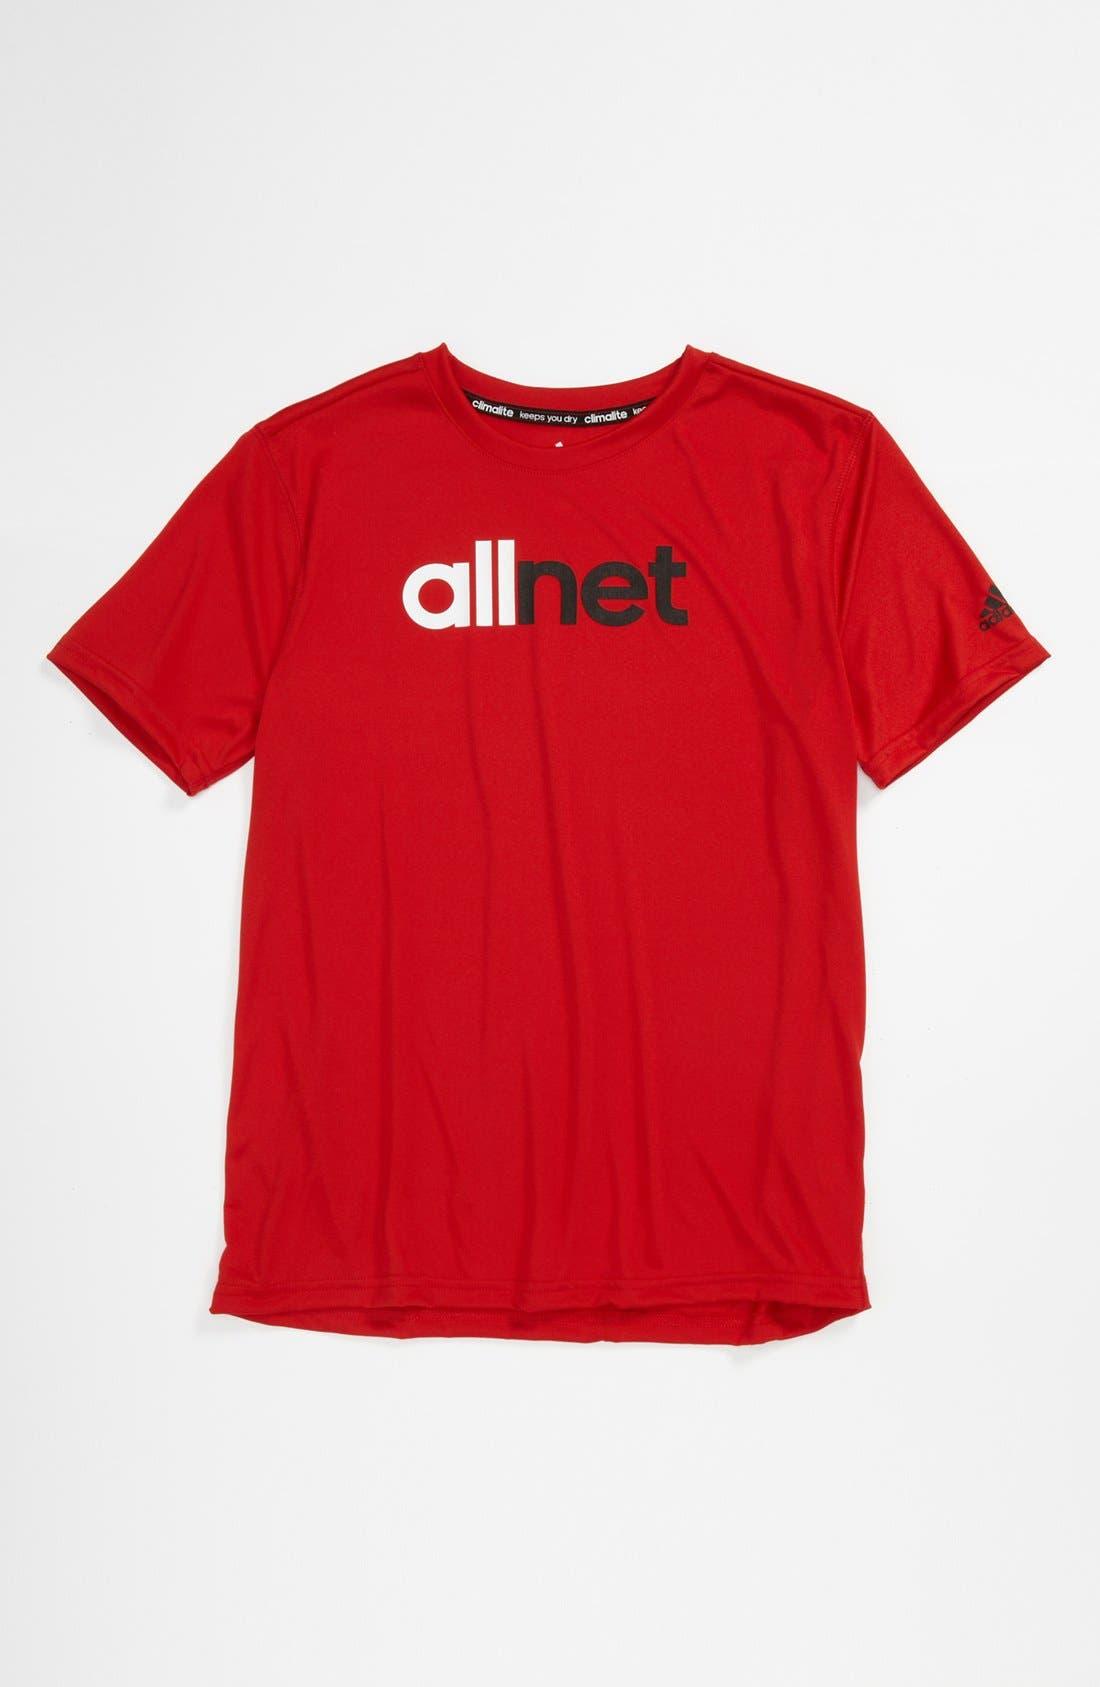 Alternate Image 1 Selected - adidas 'All Net' T-shirt (Big Boys)